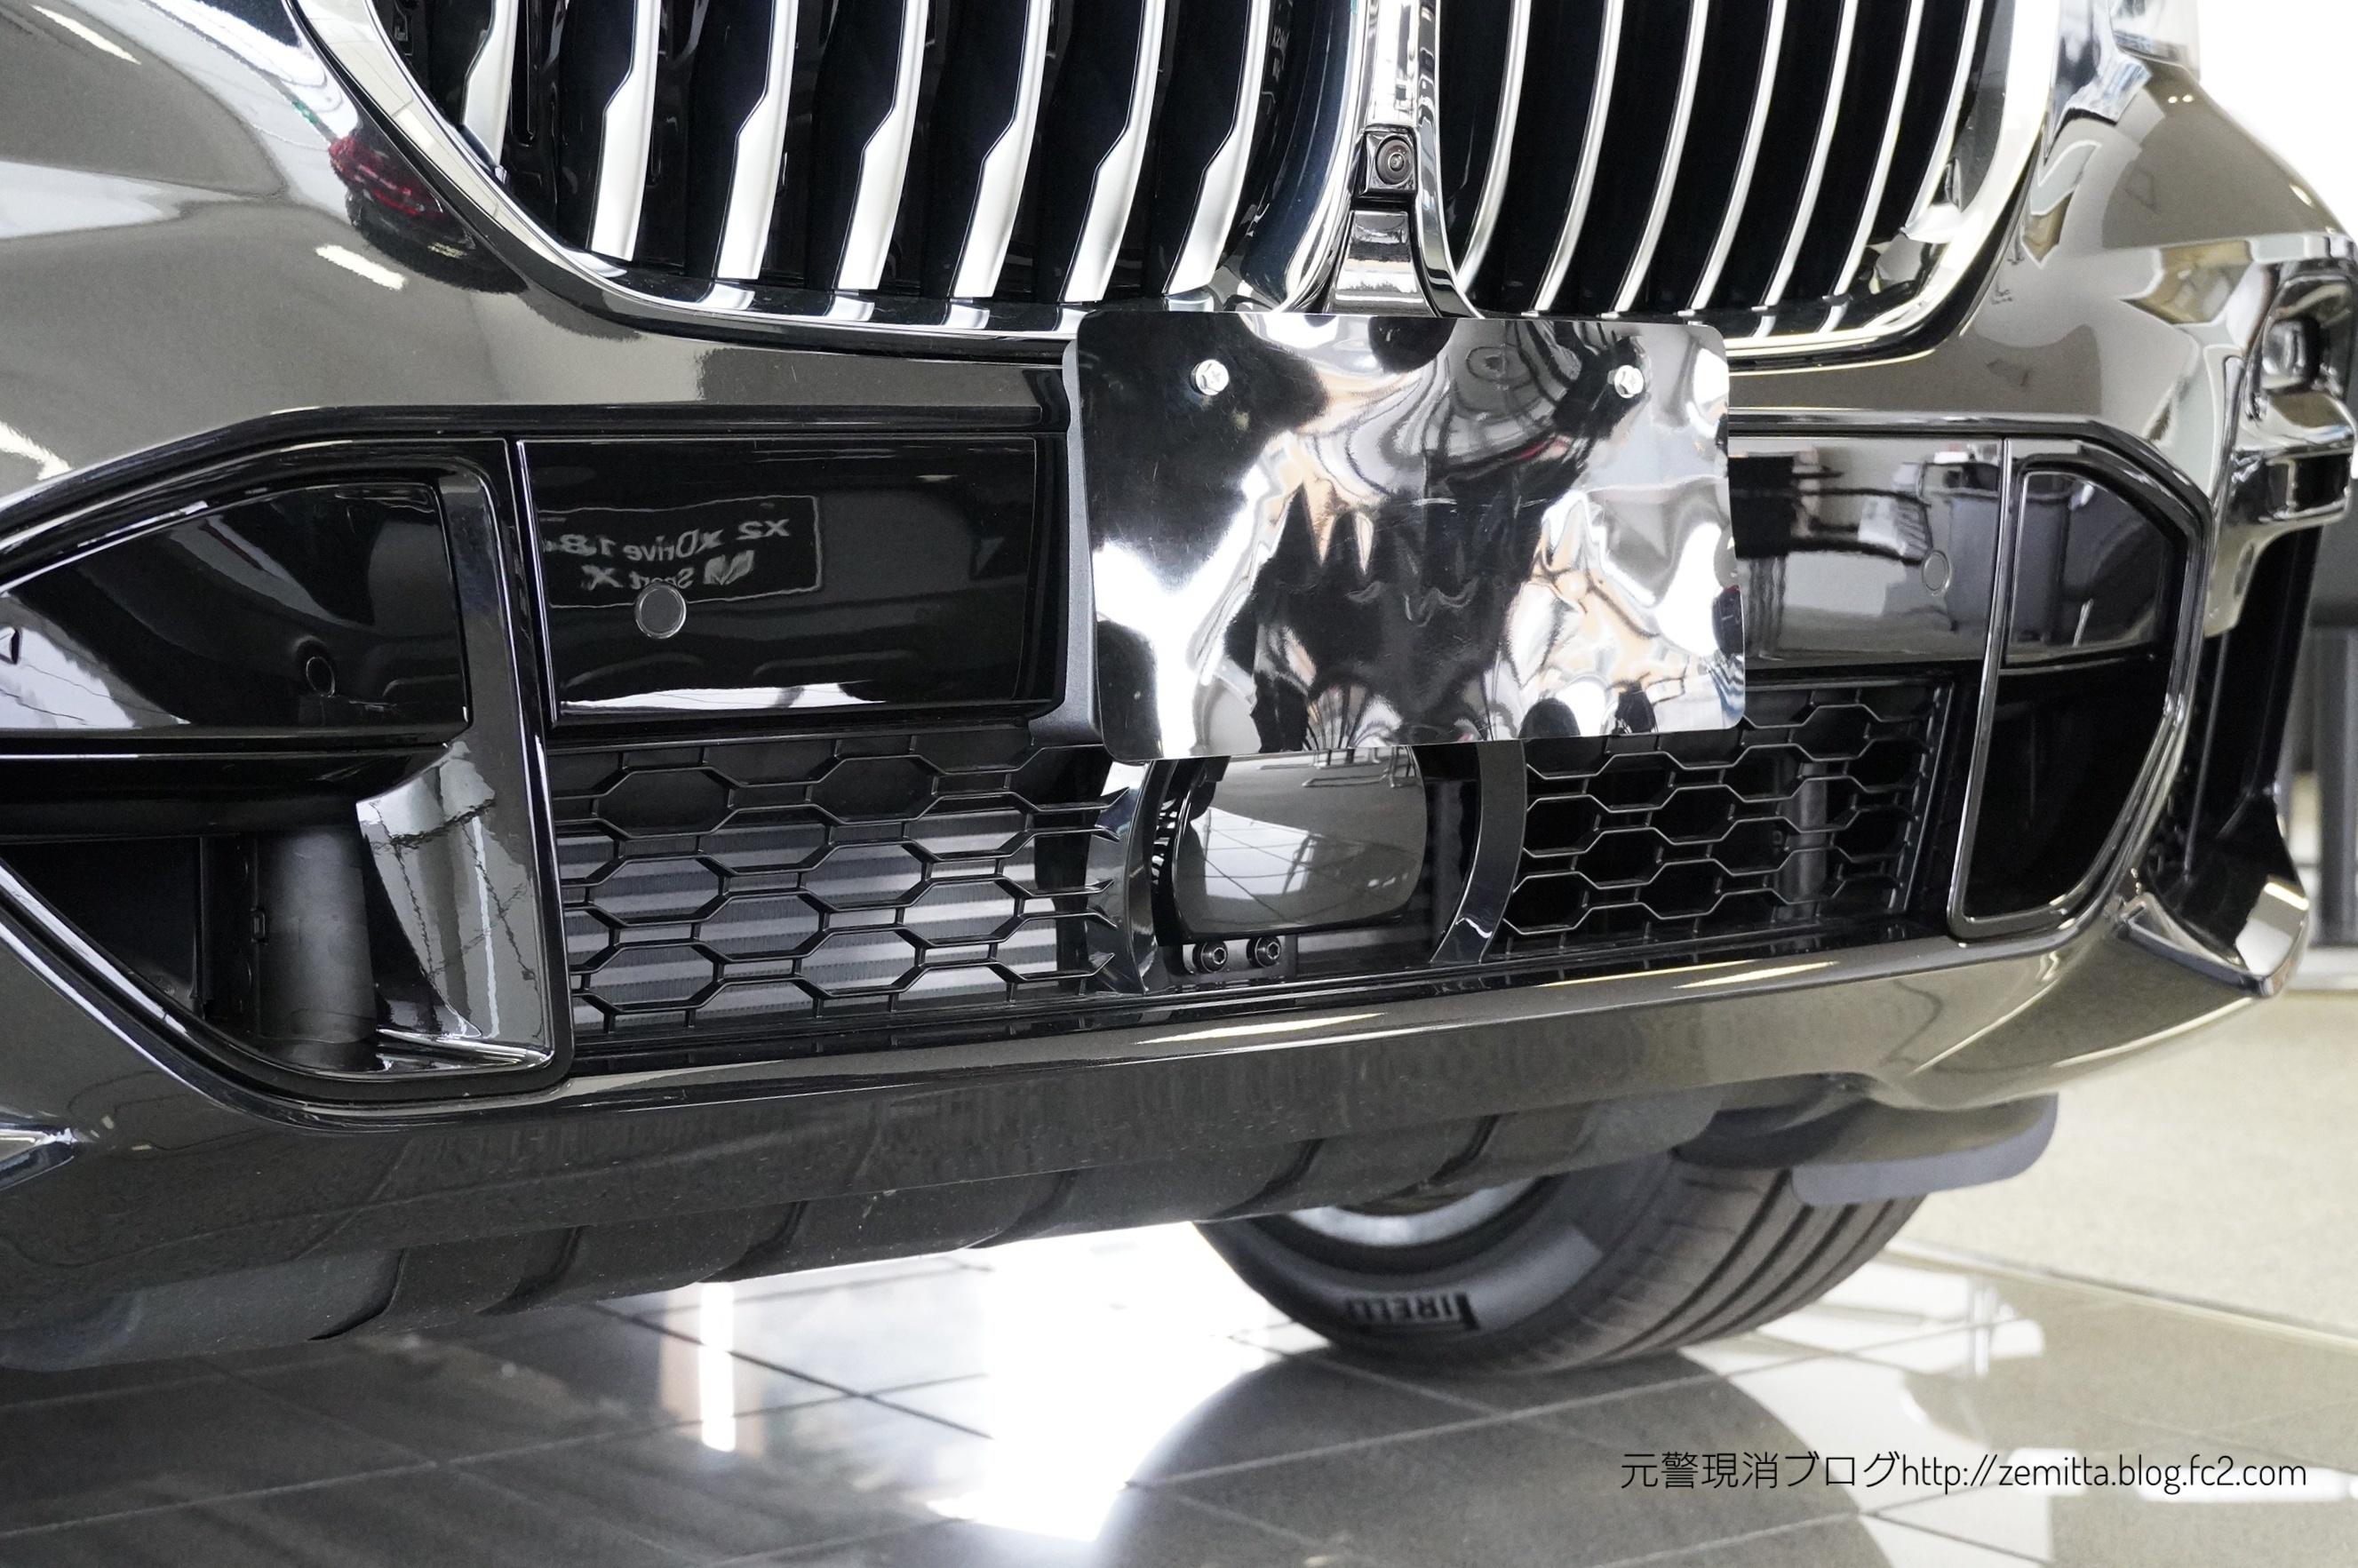 BMWX5ex9.jpeg